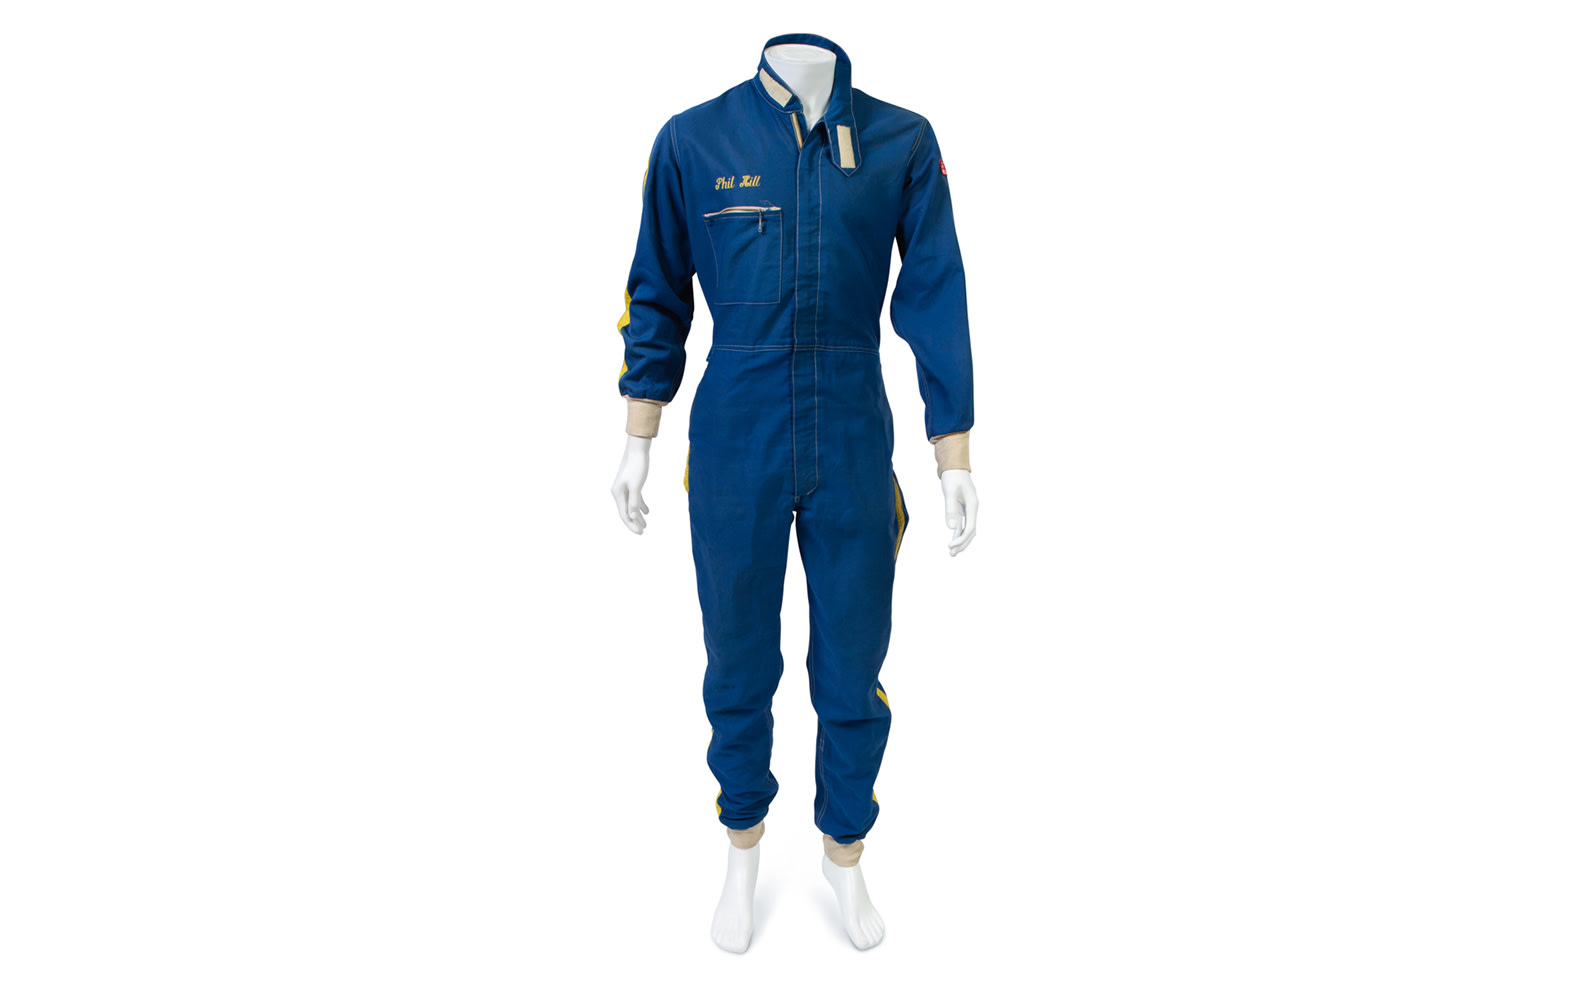 Prod/O21C - Phil Hill B 2021/B0268_Simpson Nomex Driving Suit/B0268_Simpson_Nomex_Driving_Suit_1_yqavri